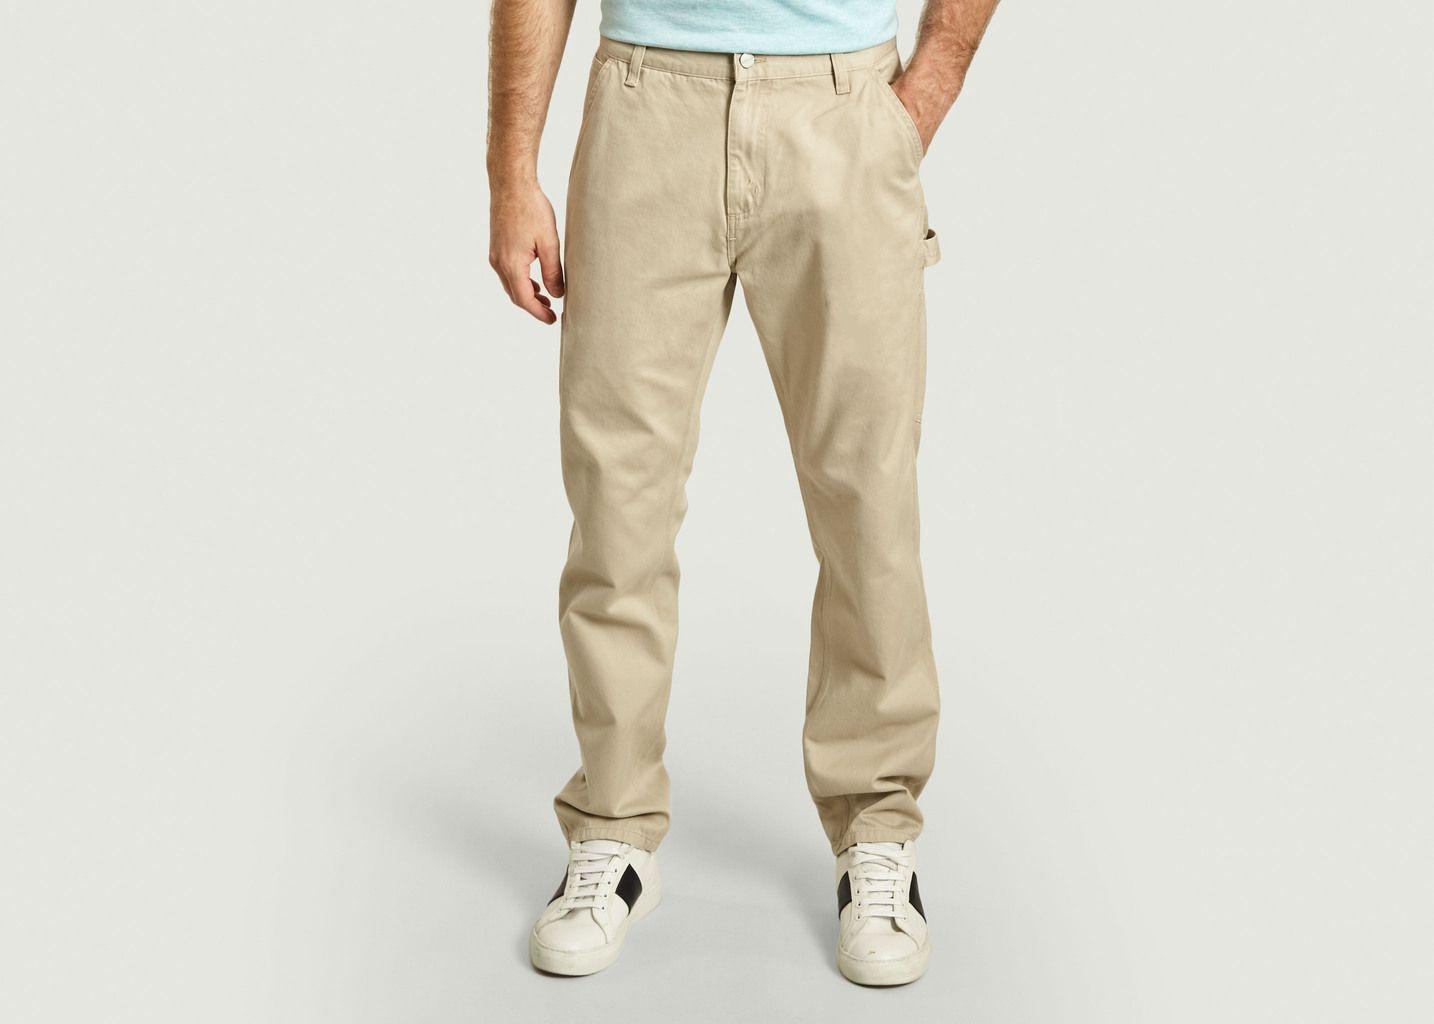 Pantalon en coton Ruck - Carhartt WIP